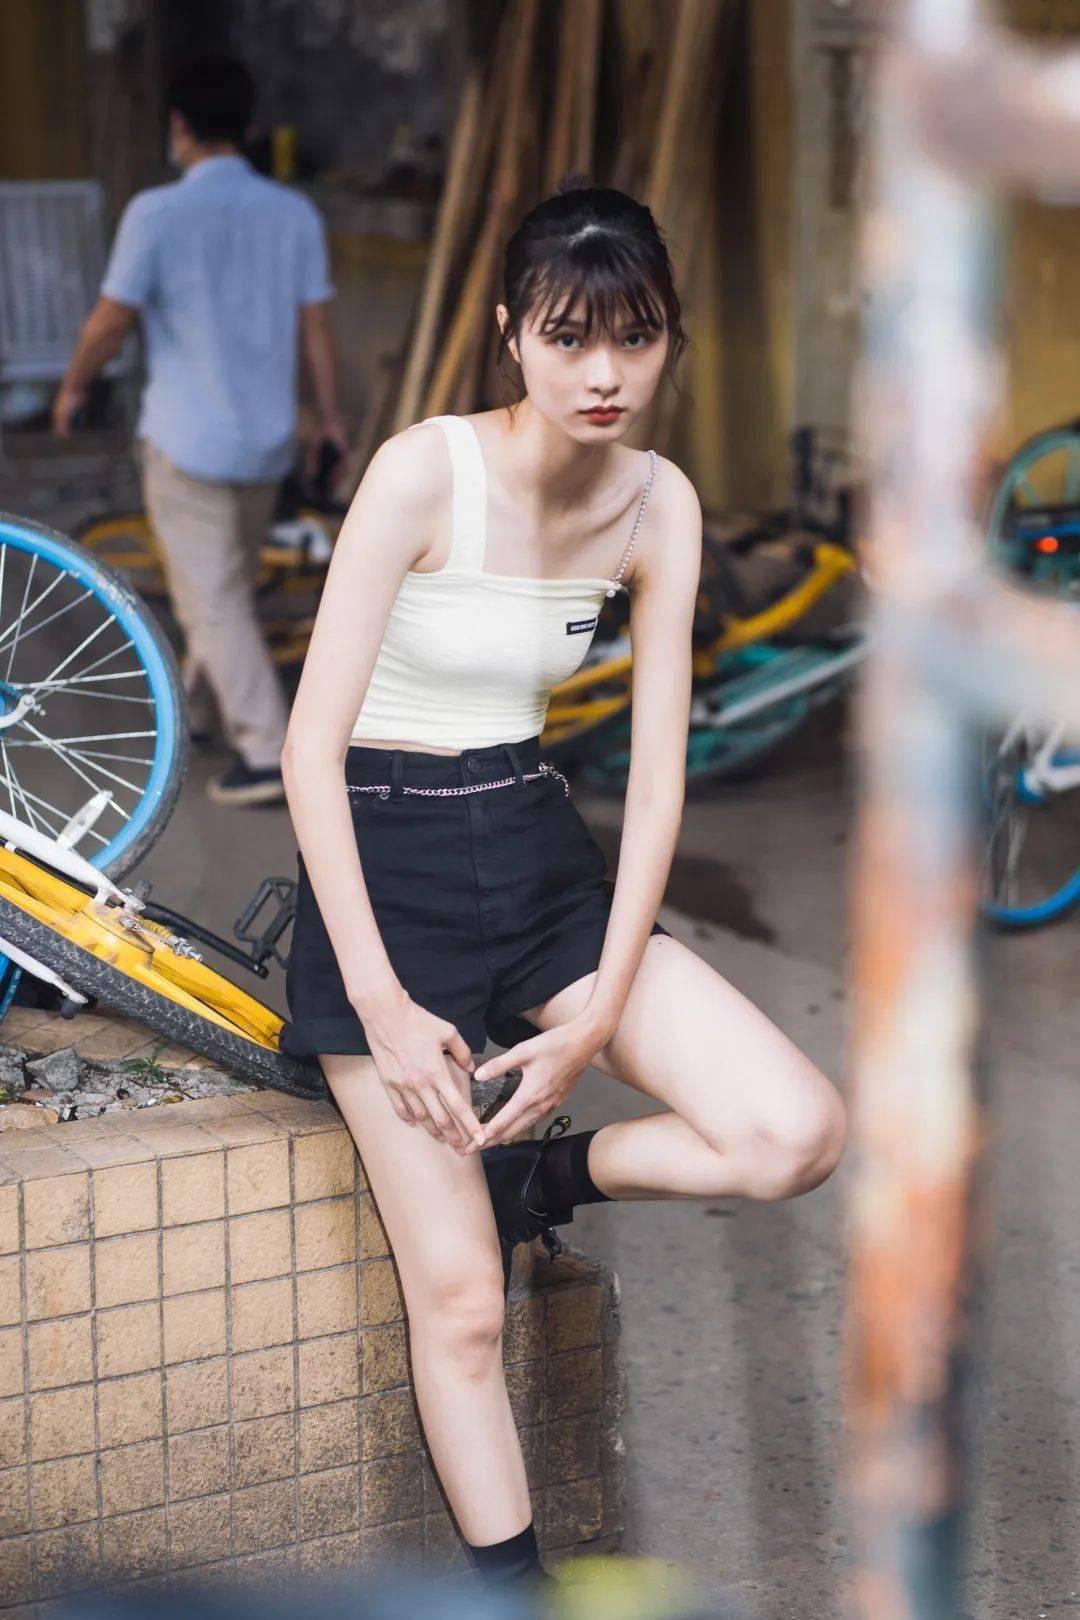 :street|护肤品还分性别,这算歧视吗?